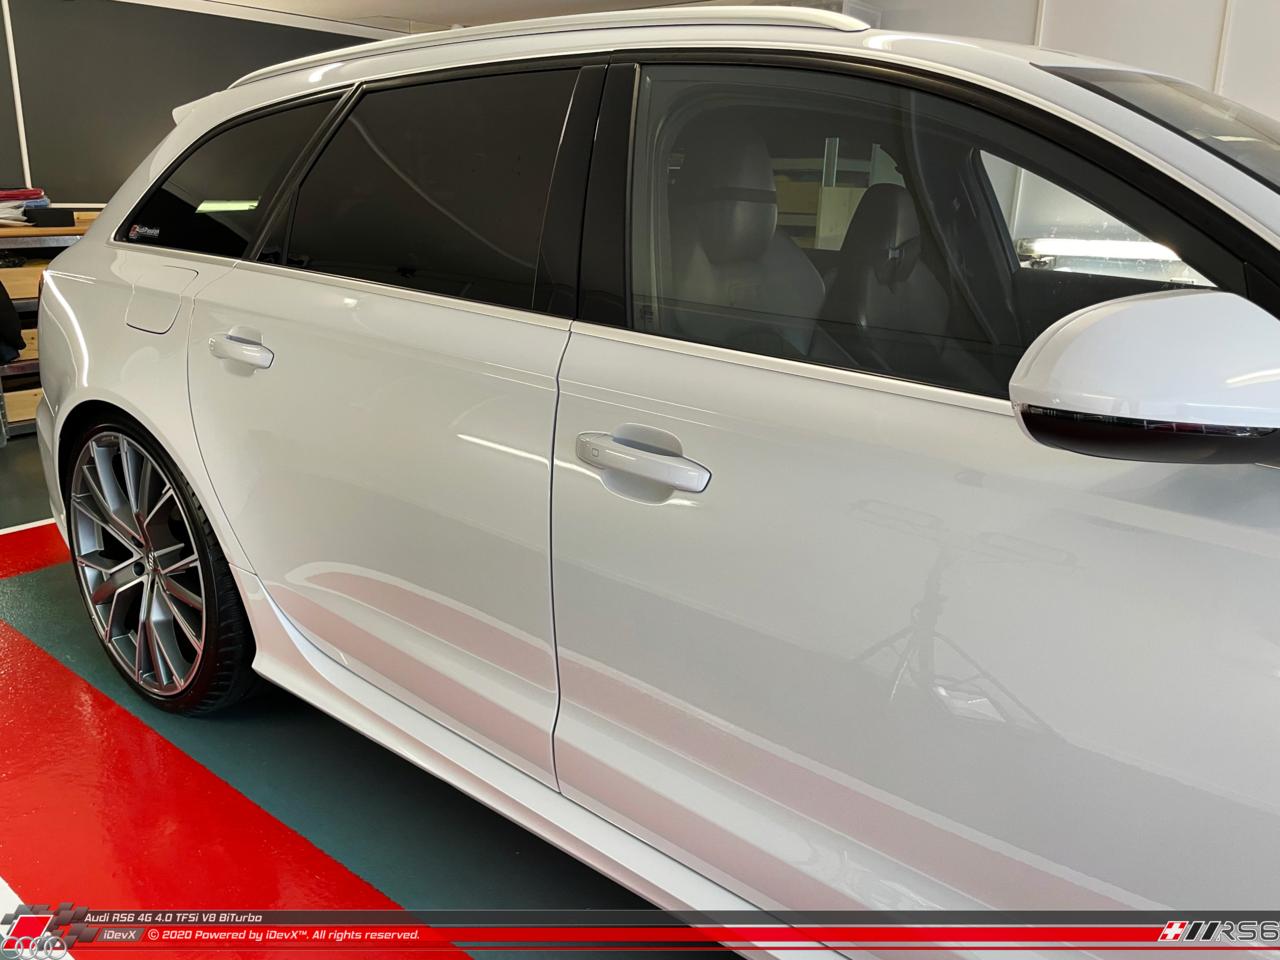 19.02.2021_Audi-RS6_iDevX_010.png